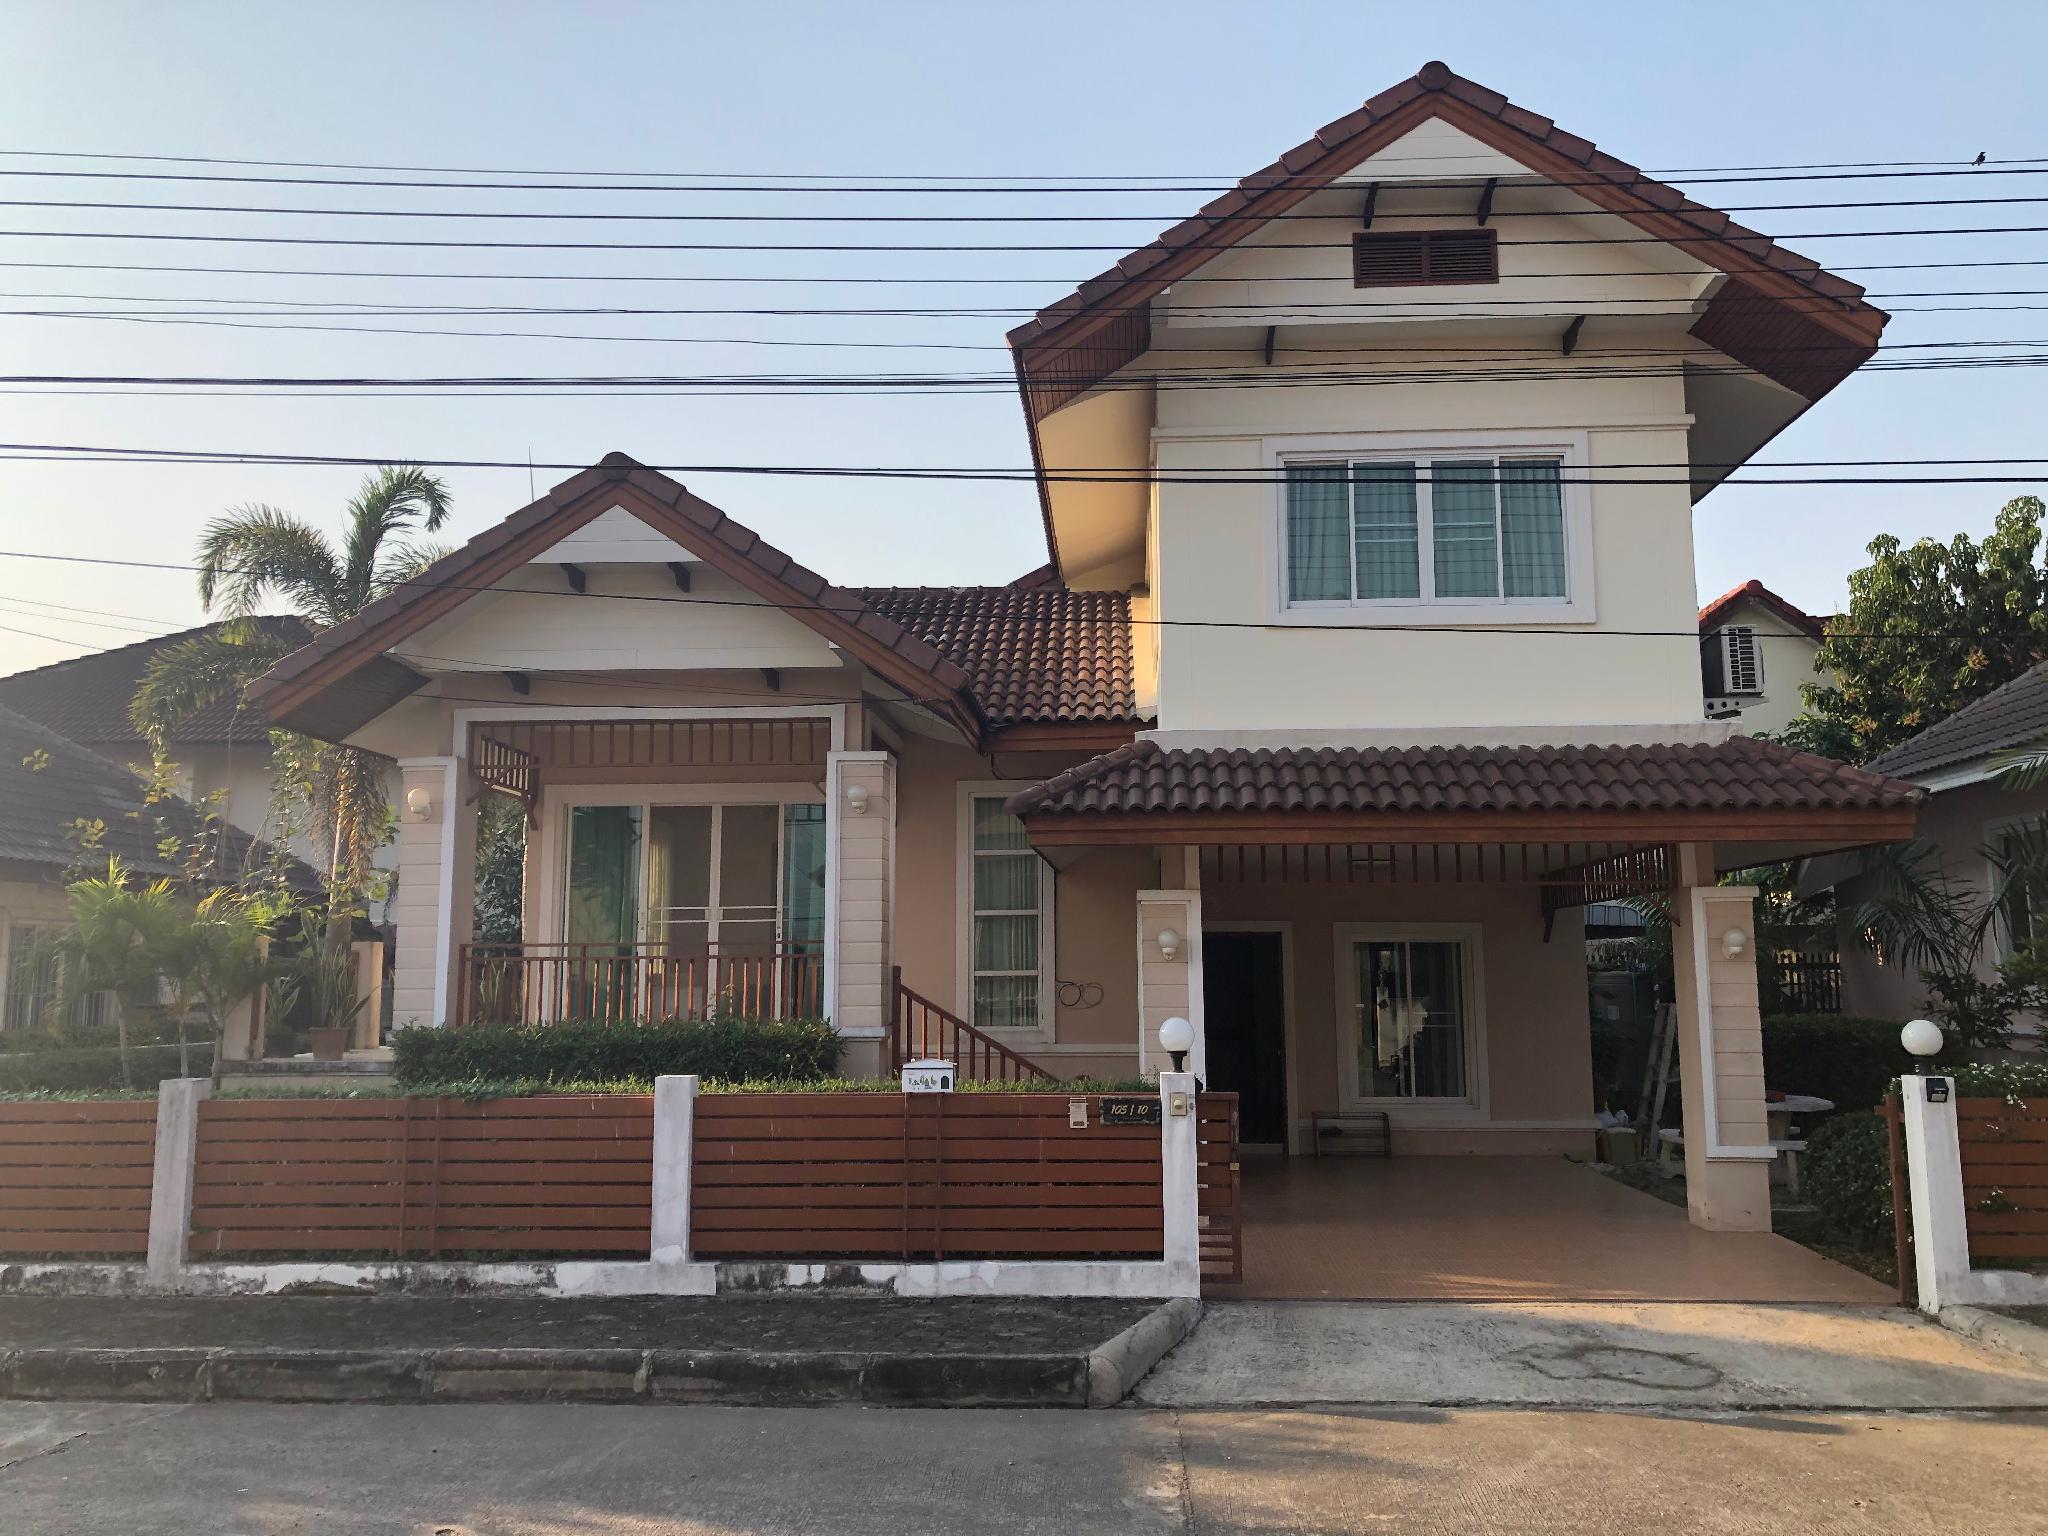 3 bedroom house on road near maejo university บ้านเดี่ยว 3 ห้องนอน 3 ห้องน้ำส่วนตัว ขนาด 211 ตร.ม. – แม่โจ้